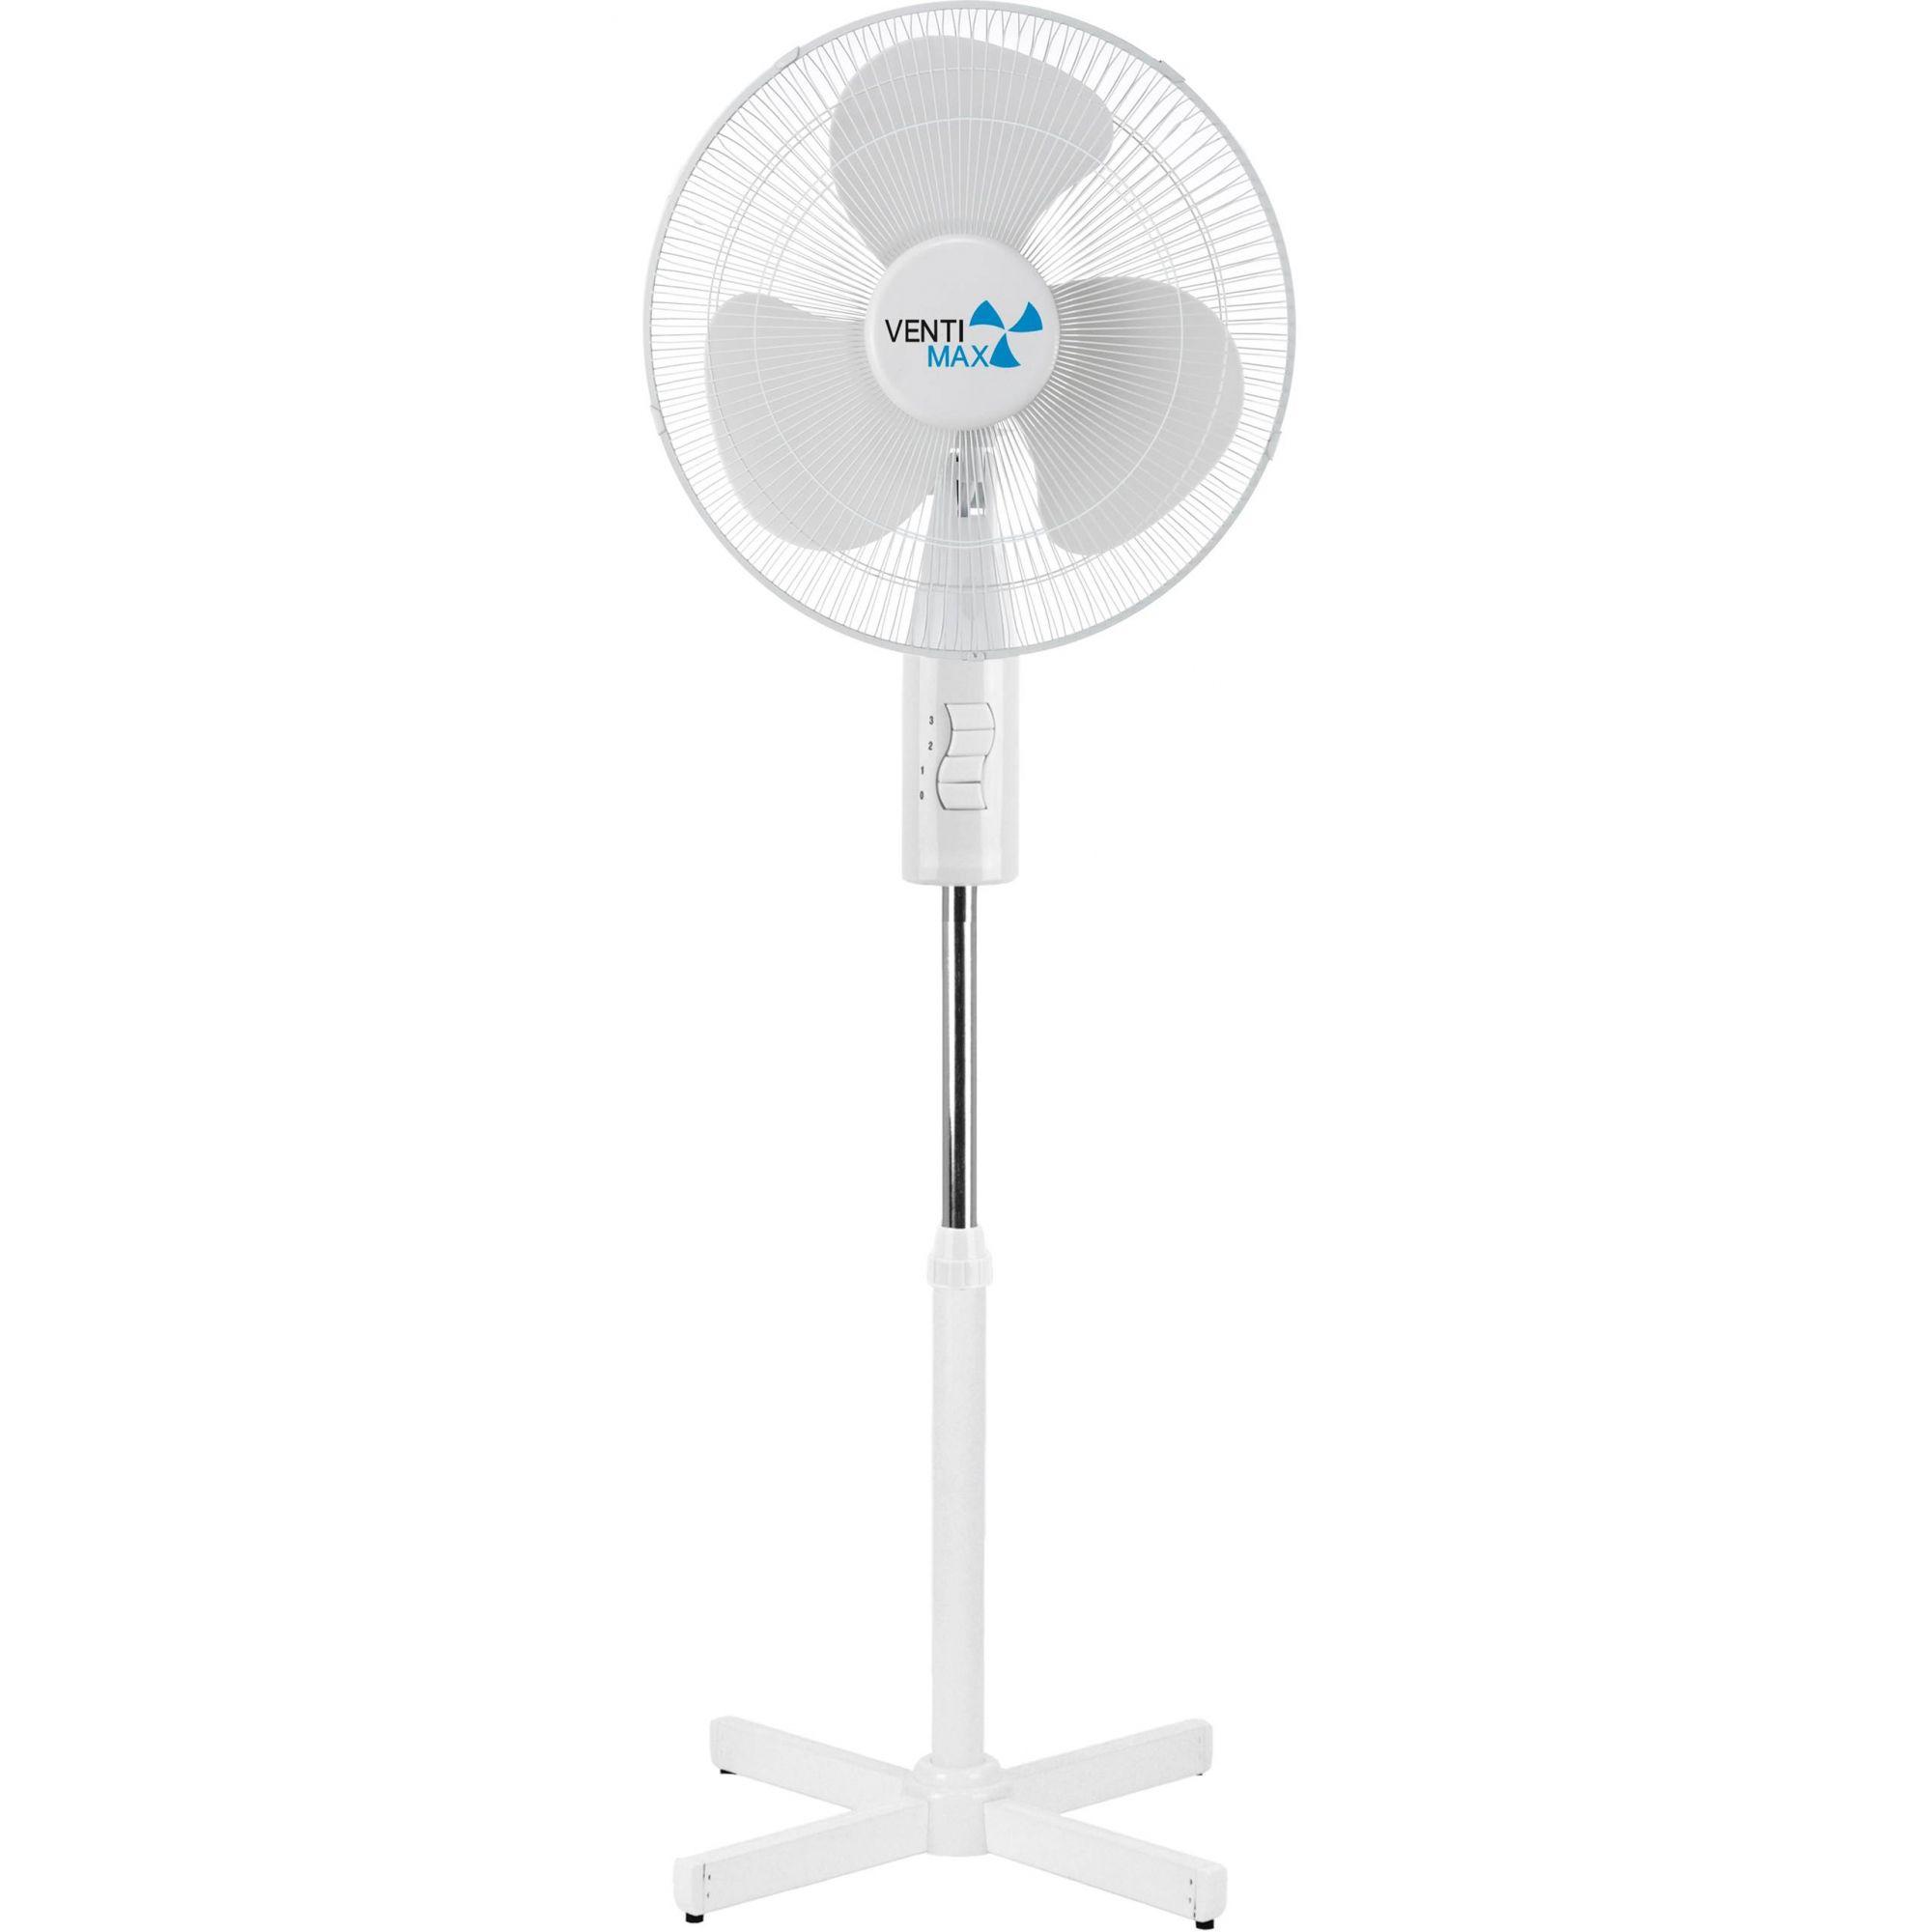 Ventilador Ventimax com Pedestal Branco